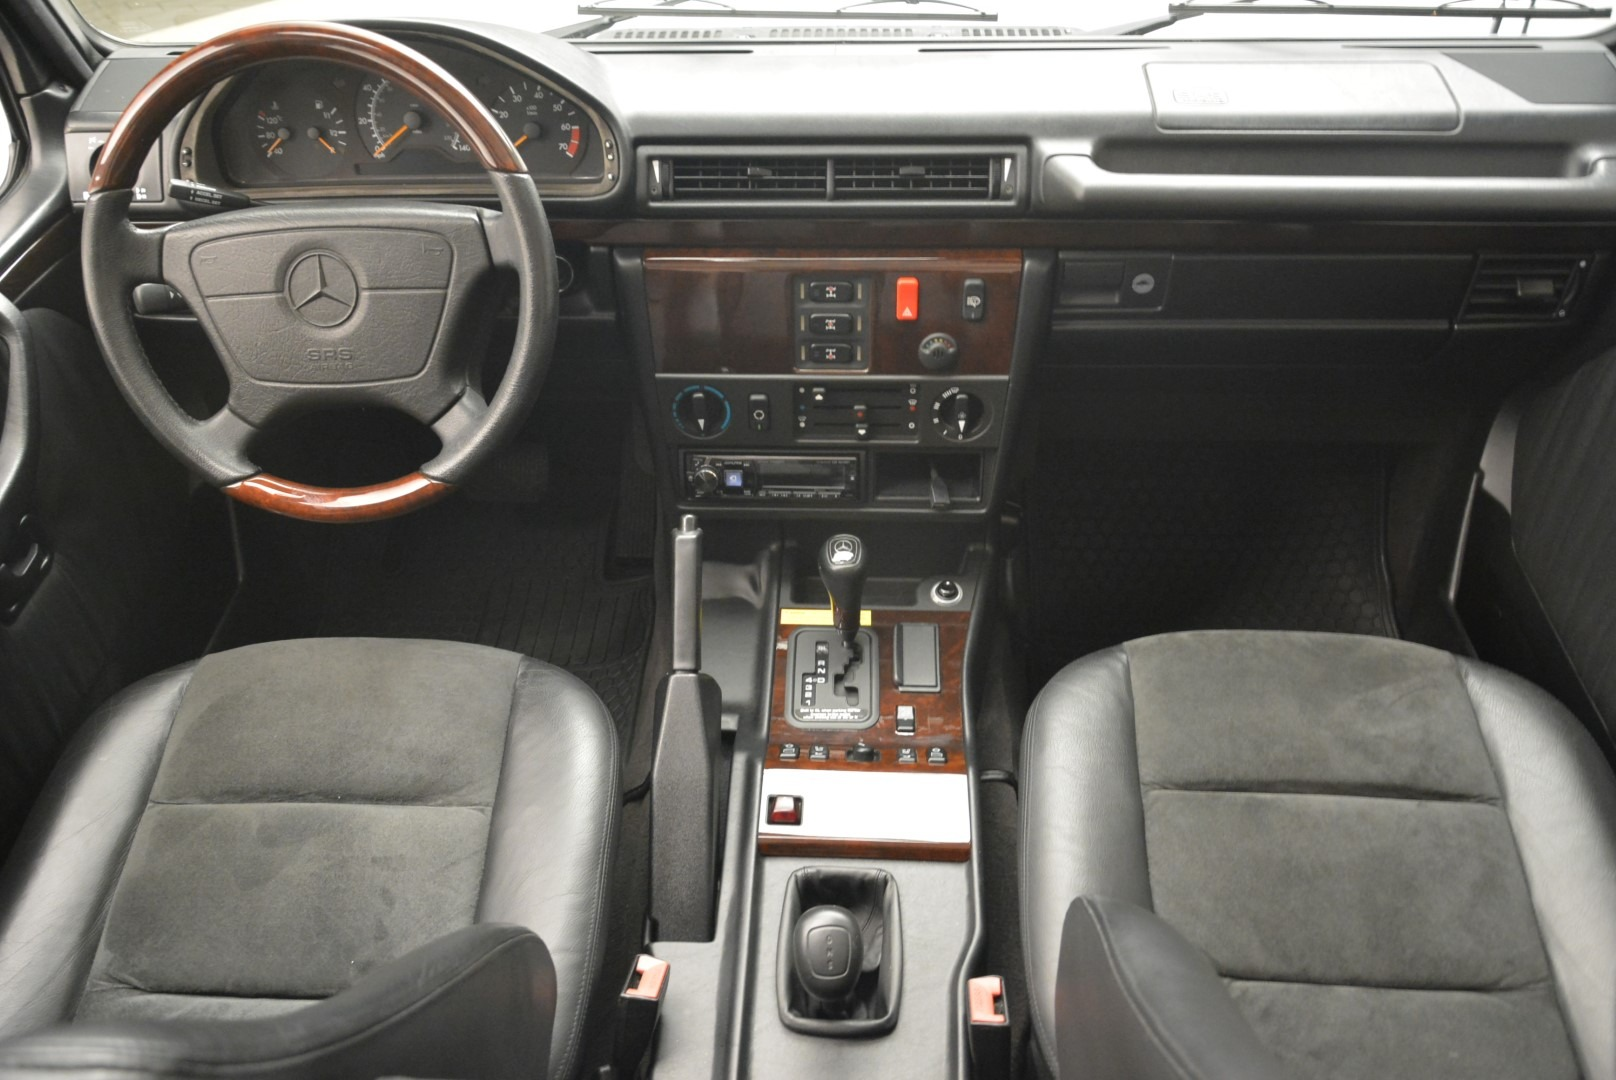 Used 2000 Mercedes-Benz G500 RENNTech  For Sale In Westport, CT 2184_p19